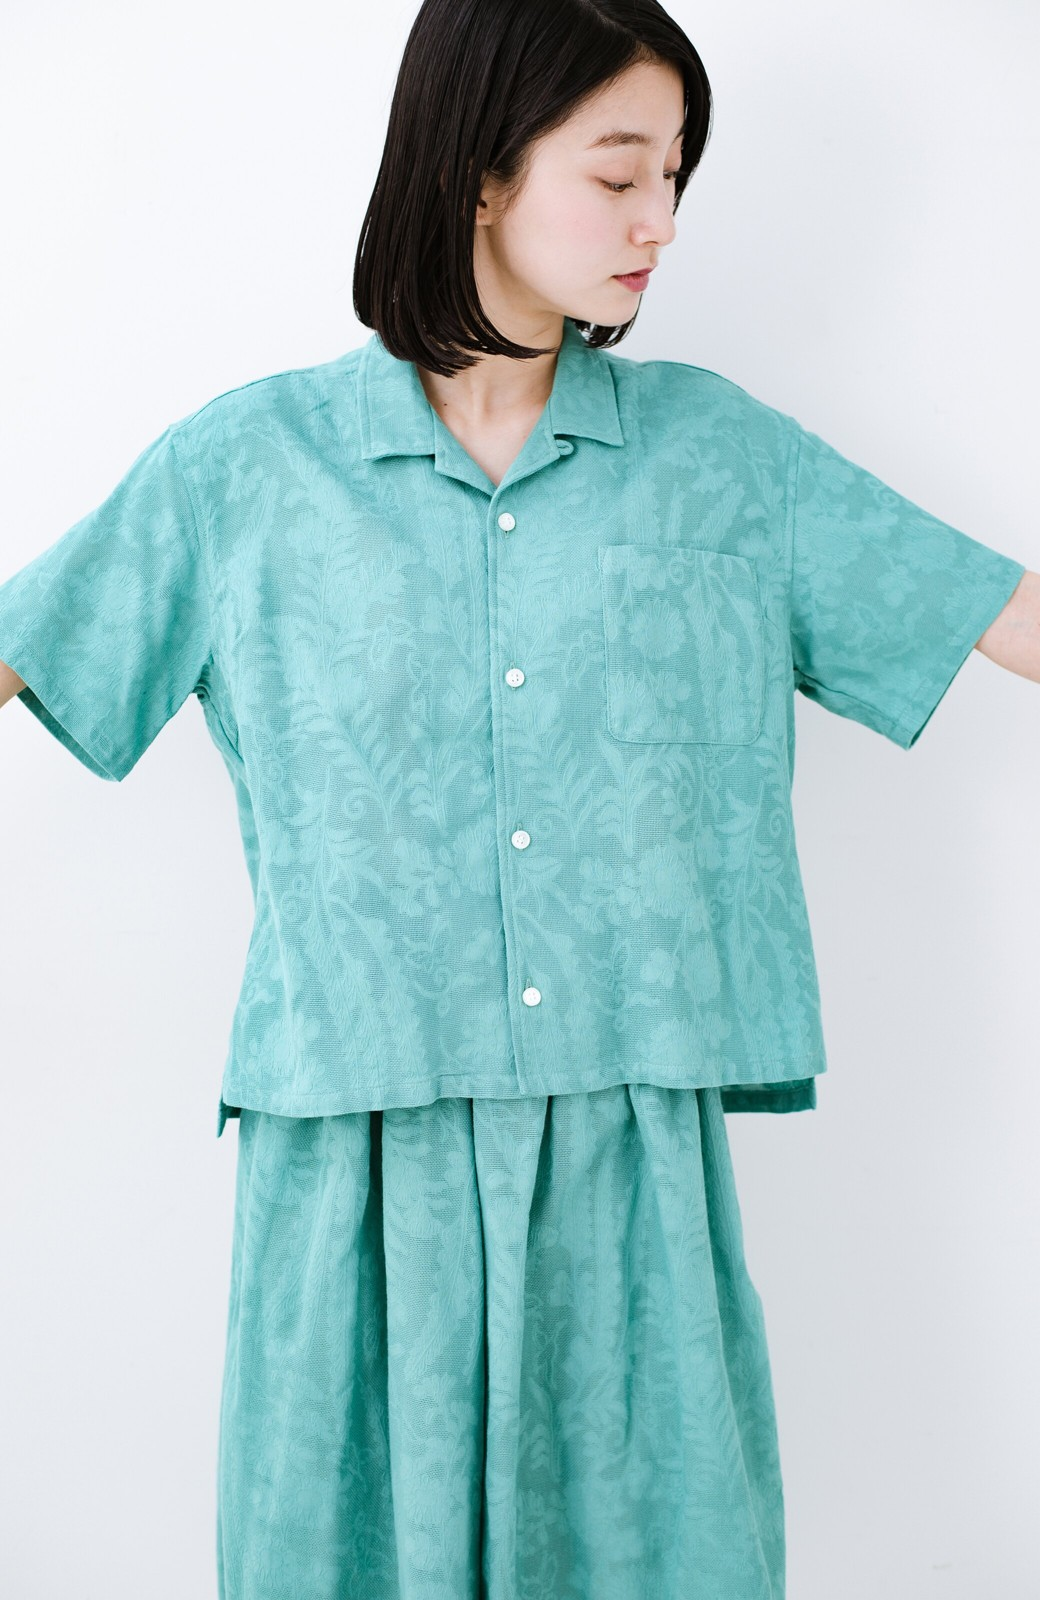 haco! 【今年も再販!】京都の浴衣屋さんと作った浴衣生地のシャツ <グリーン>の商品写真25